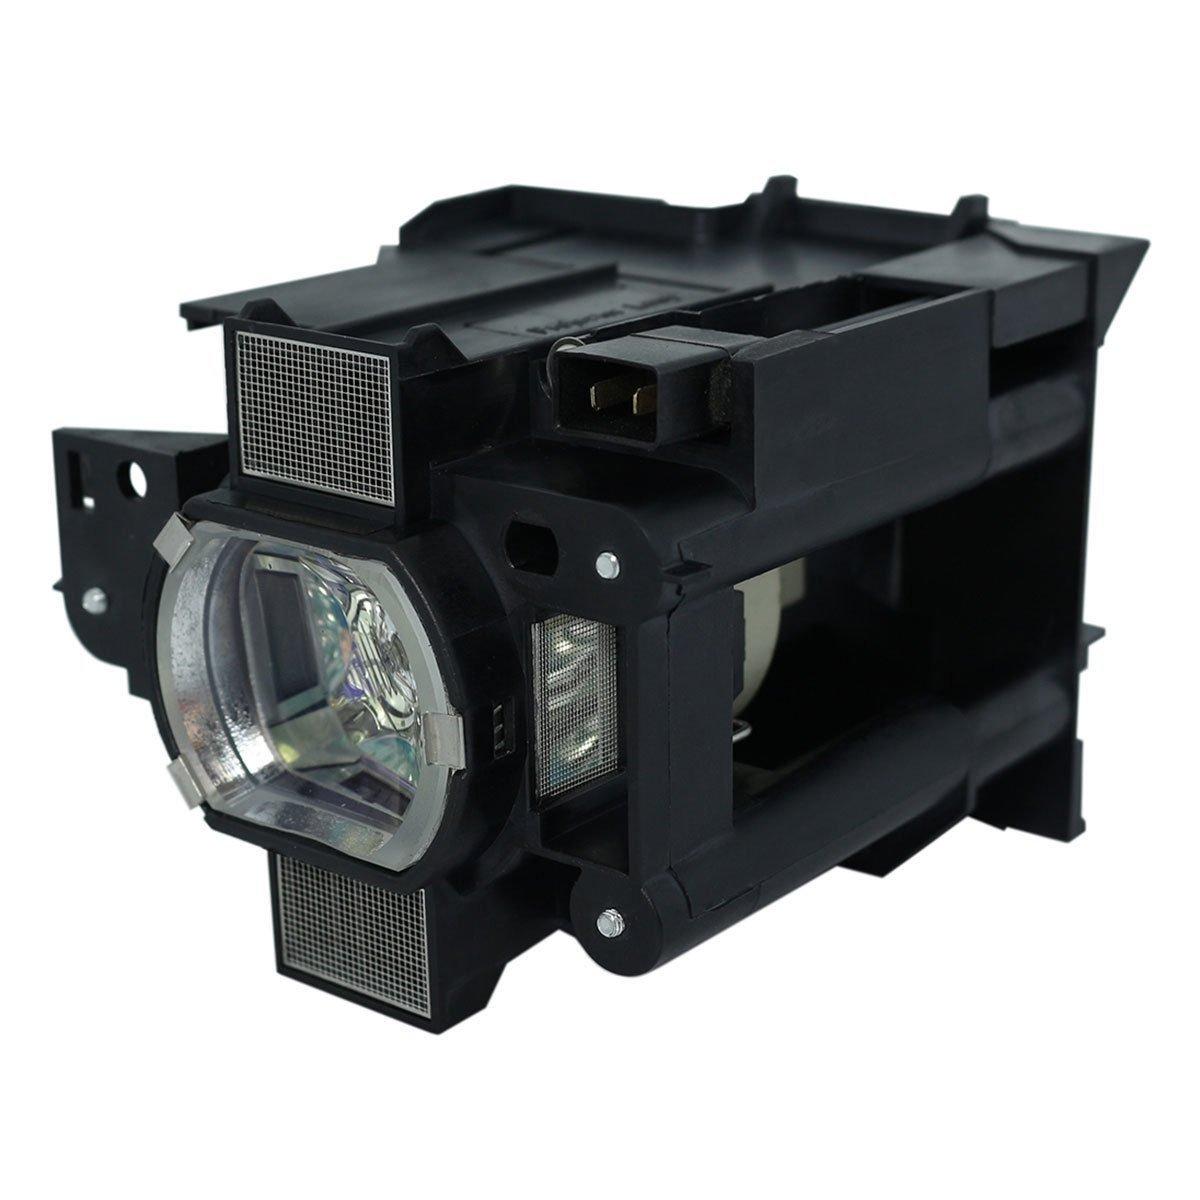 QueenYii DT01285 互換ランプ HITACHI CP-WU8440プロジェクターランプ ハウジング付き   B0763T2HWD